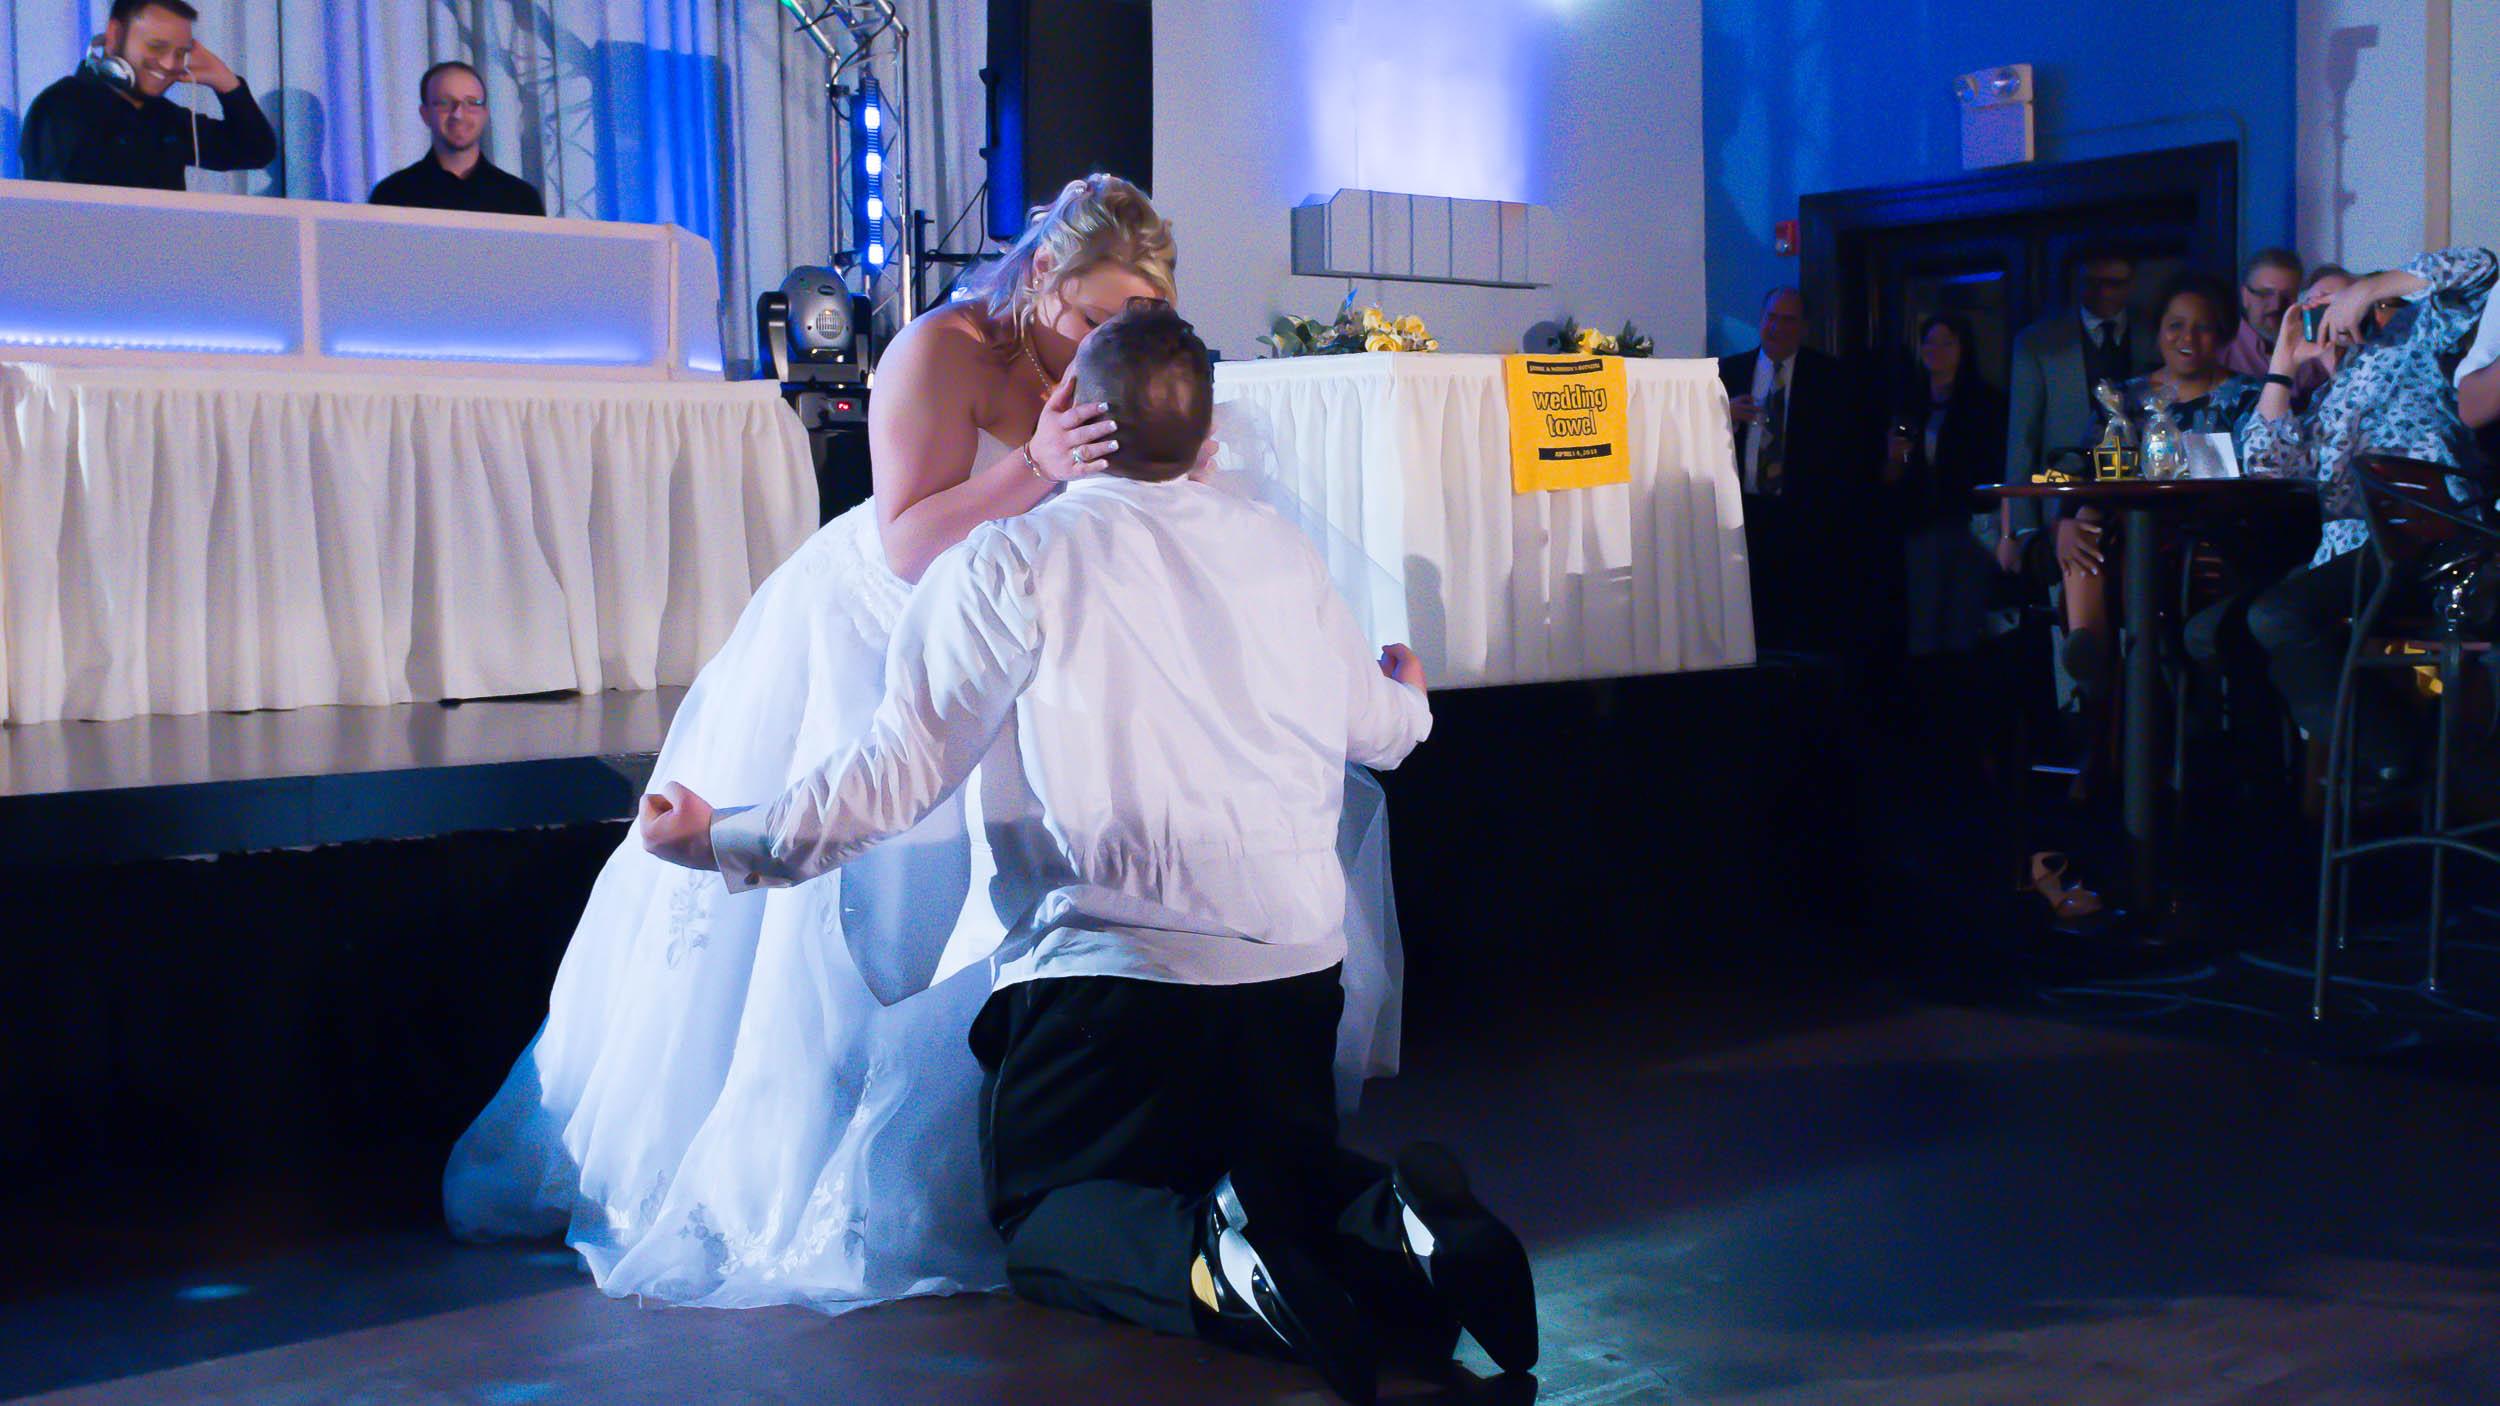 Wedding-Reception-Cefelos-Banquet-Event-Center-7.jpg